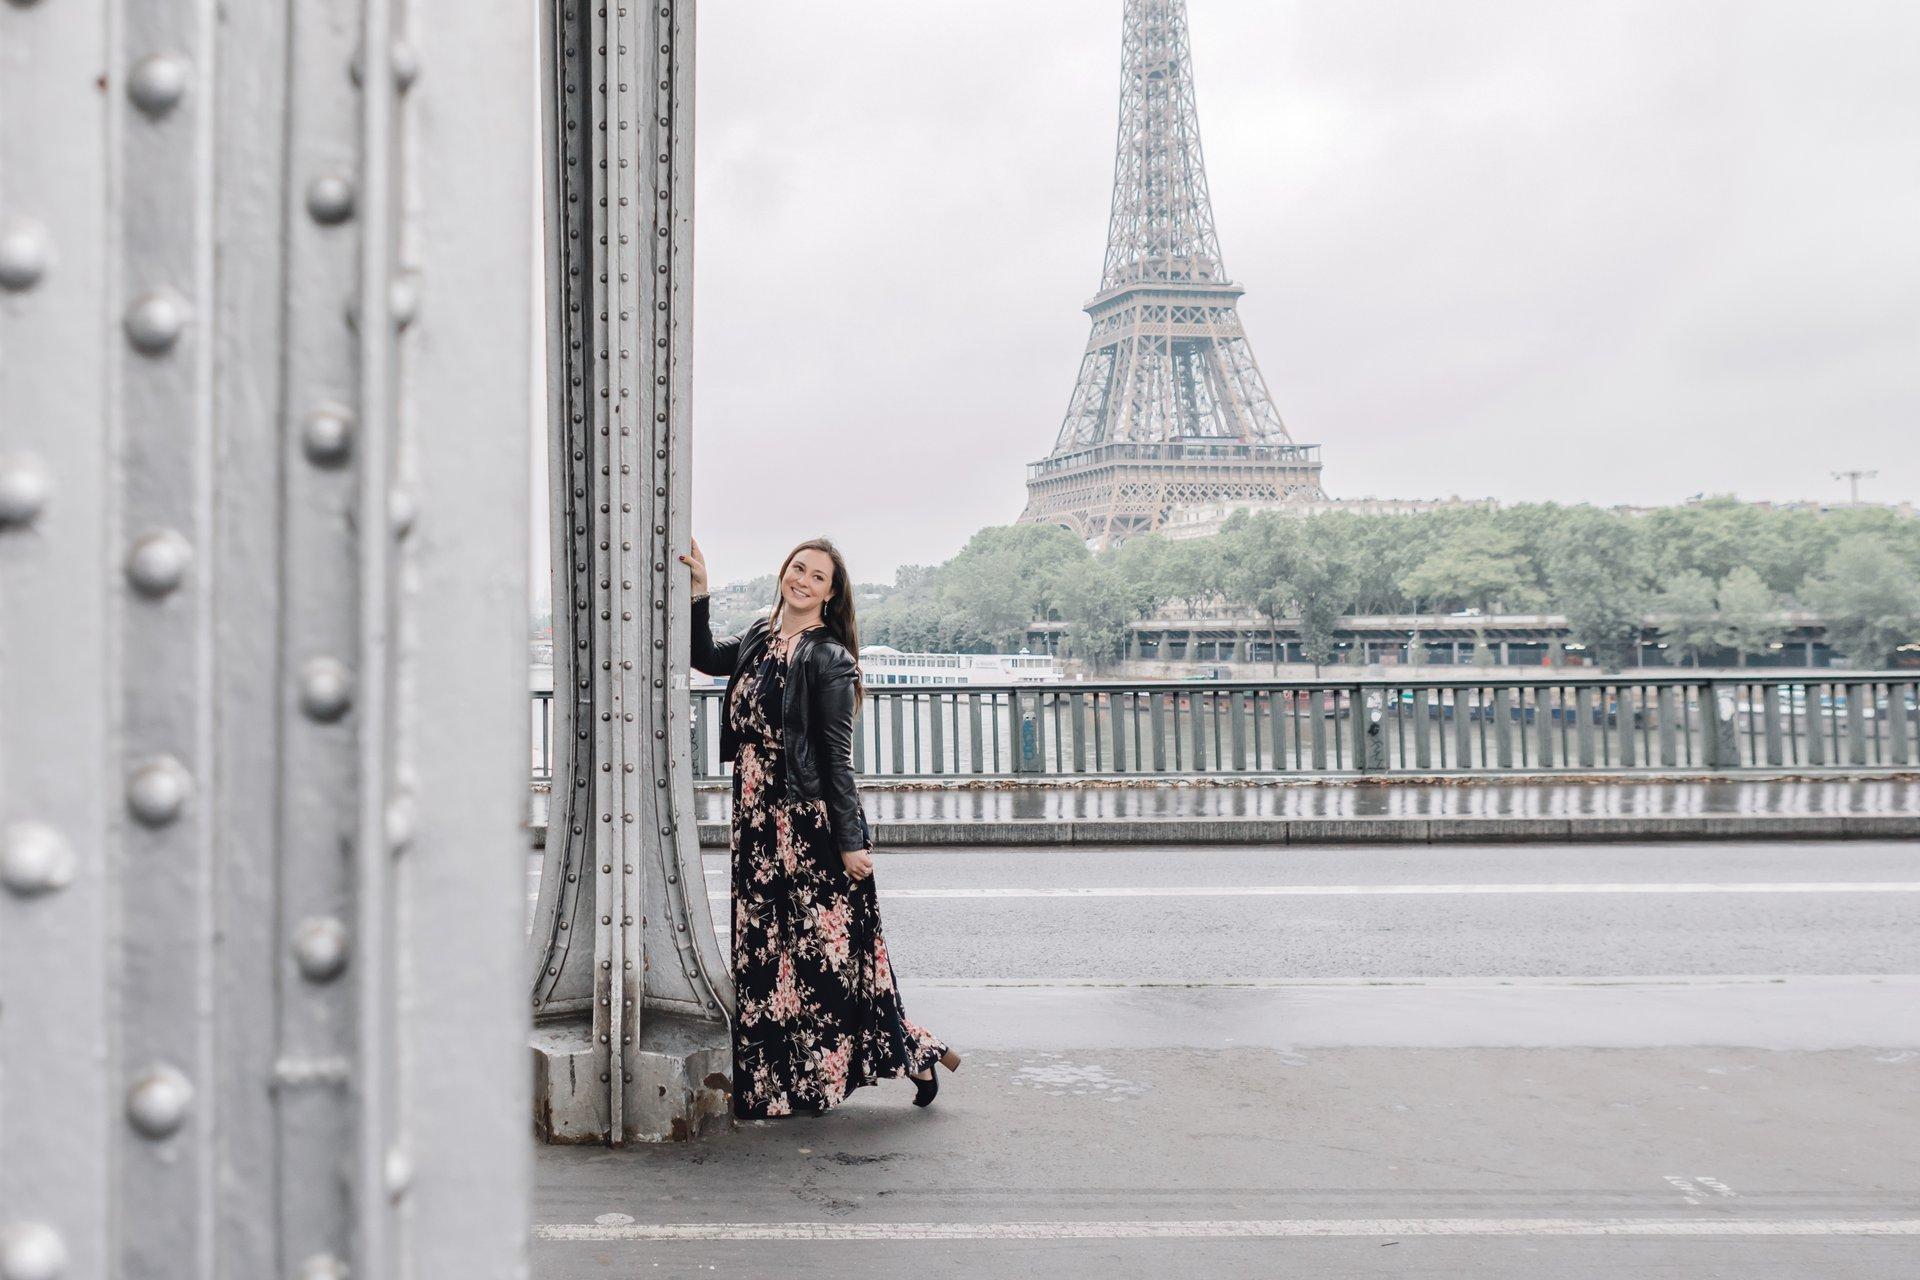 Paris-France-travel-story-Flytographer-36